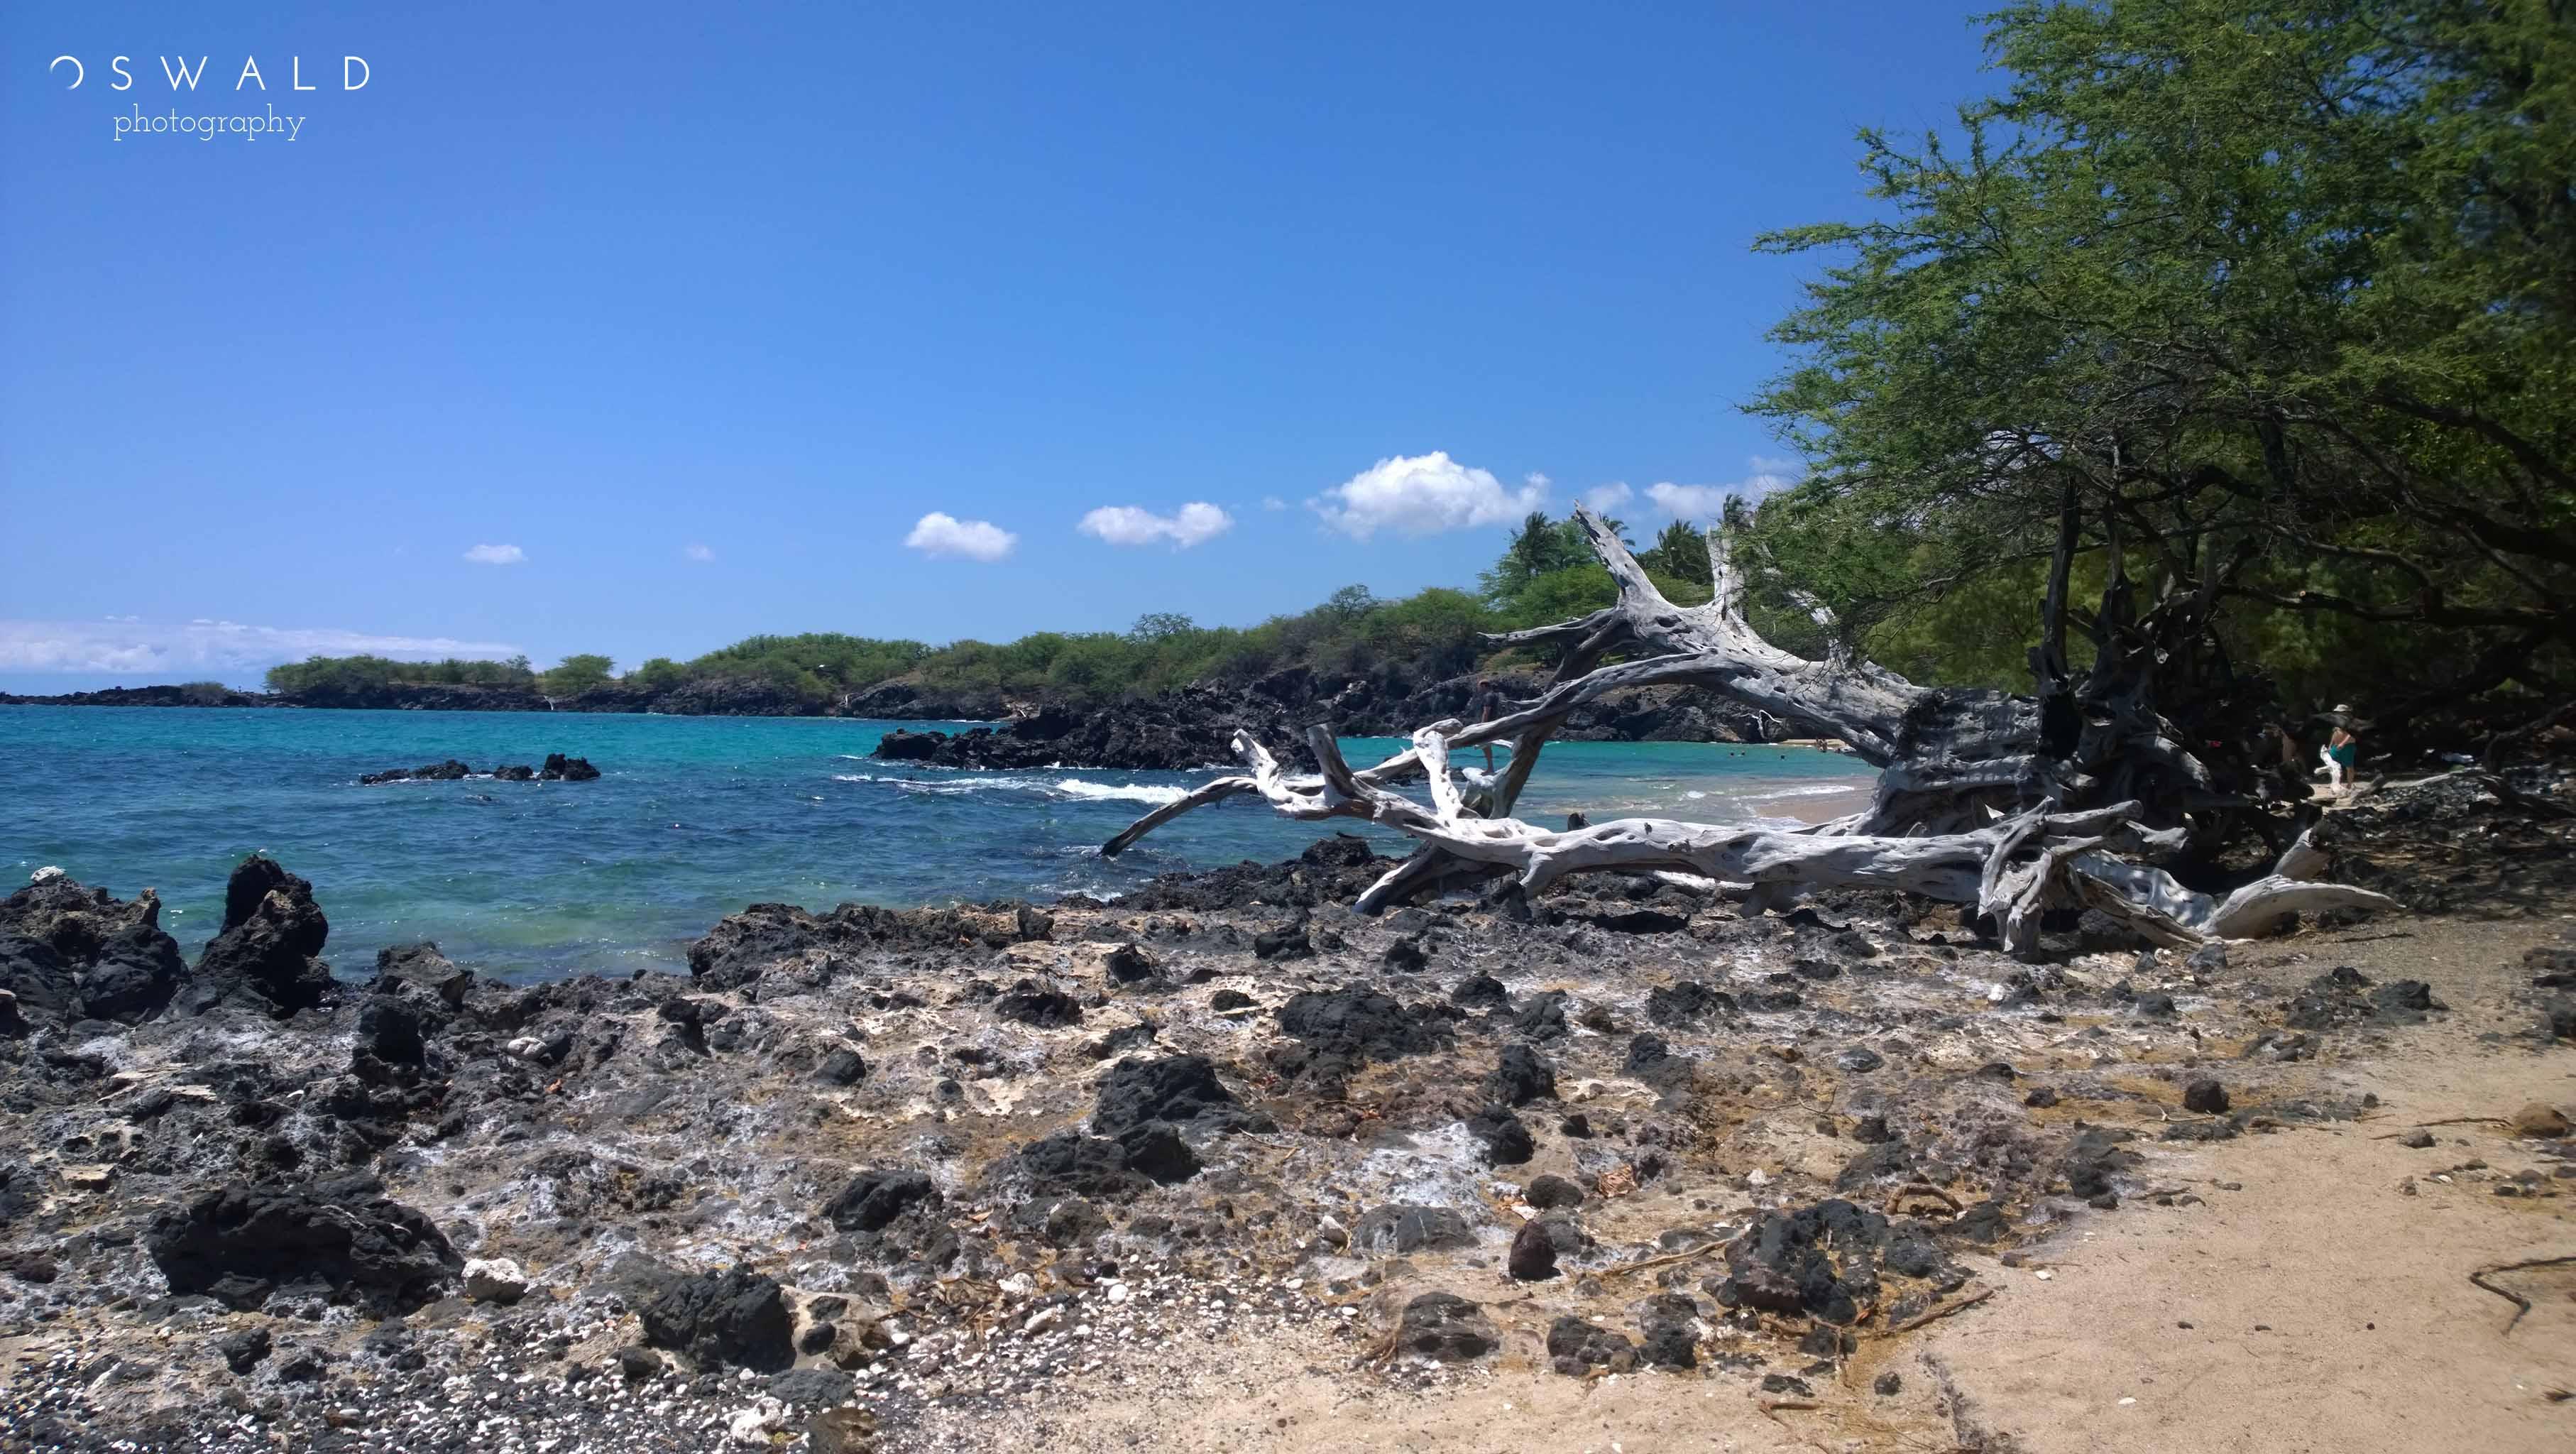 A landscape photo of Hapuna Beach on the Big Island of Hawaii.